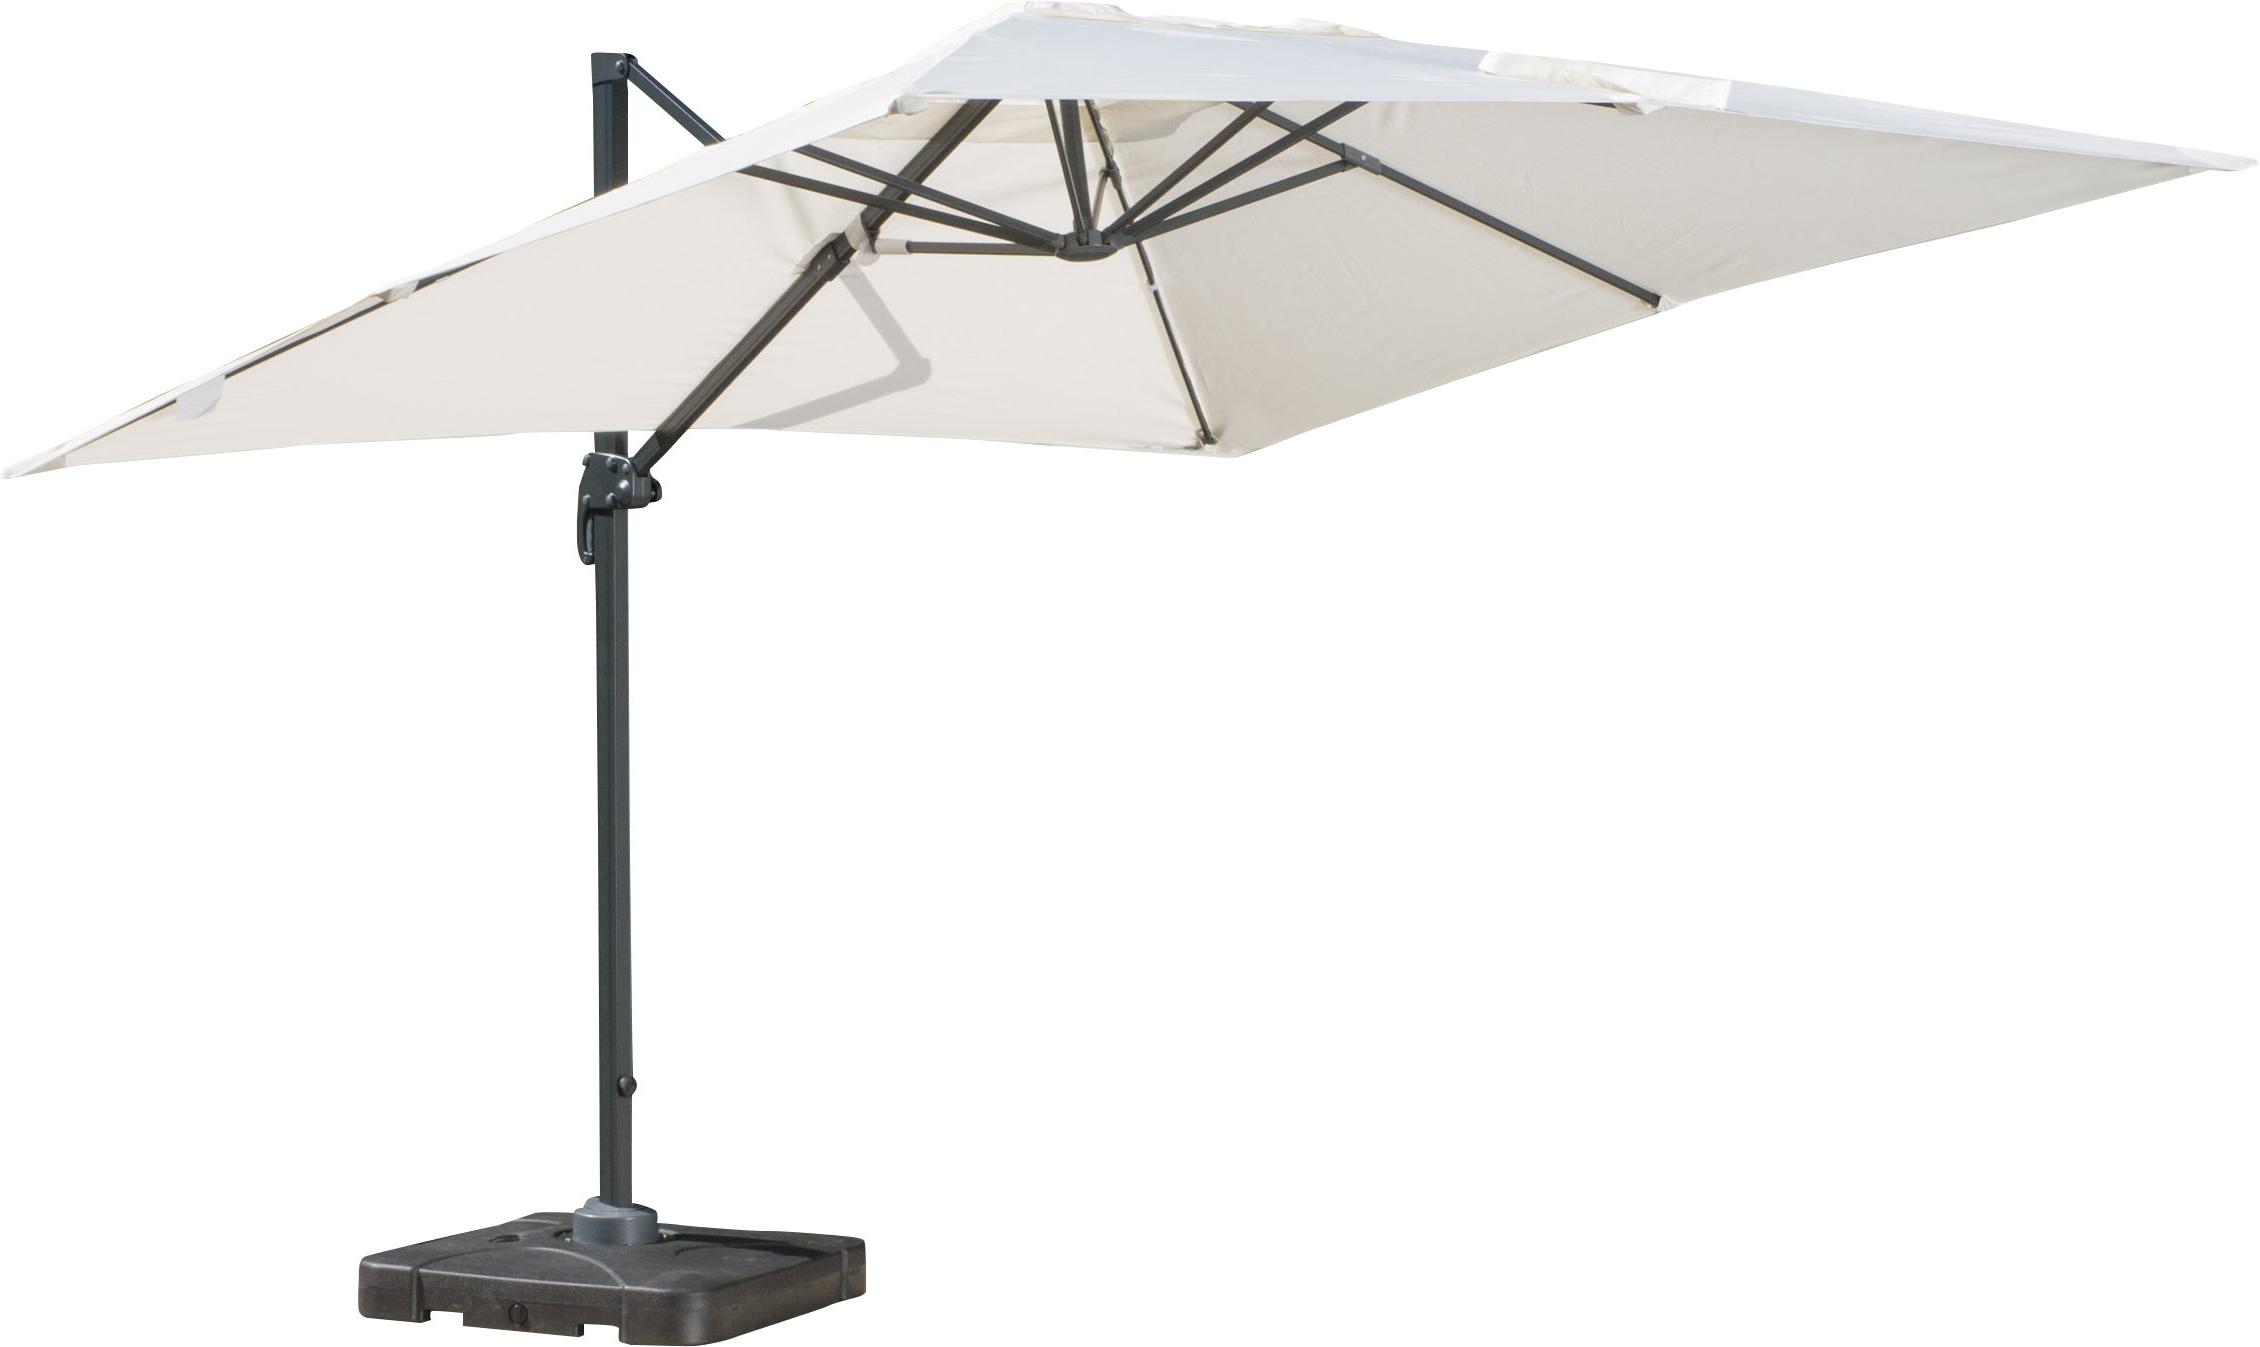 Trendy Gemmenne Square Cantilever Umbrellas For Boracay 10' Square Cantilever Umbrella (View 3 of 20)